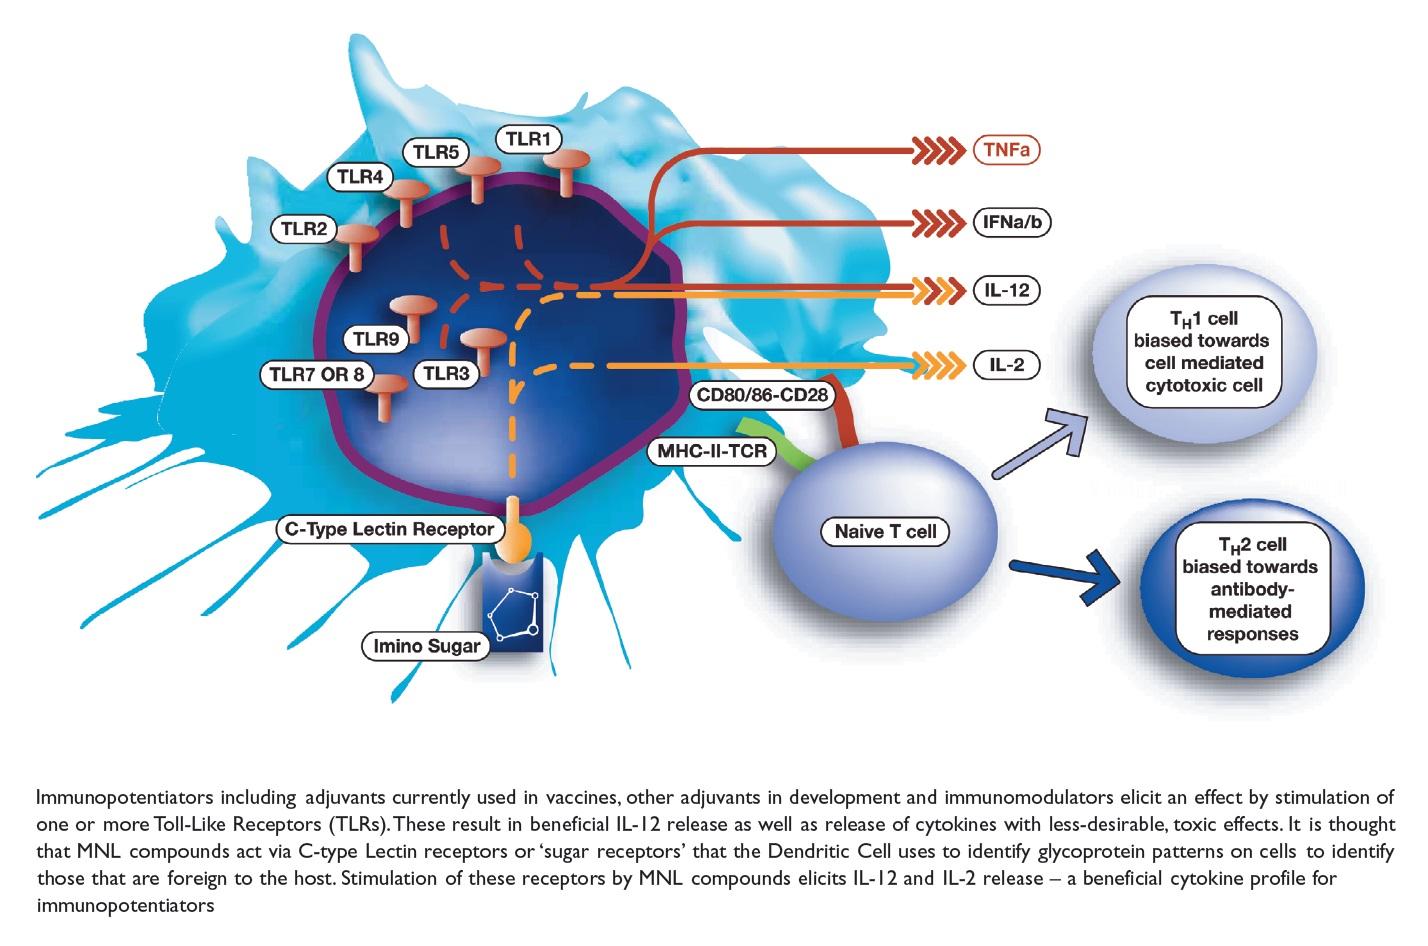 Figure 2 Immunopotentiators including adjuvants currently used in vaccines